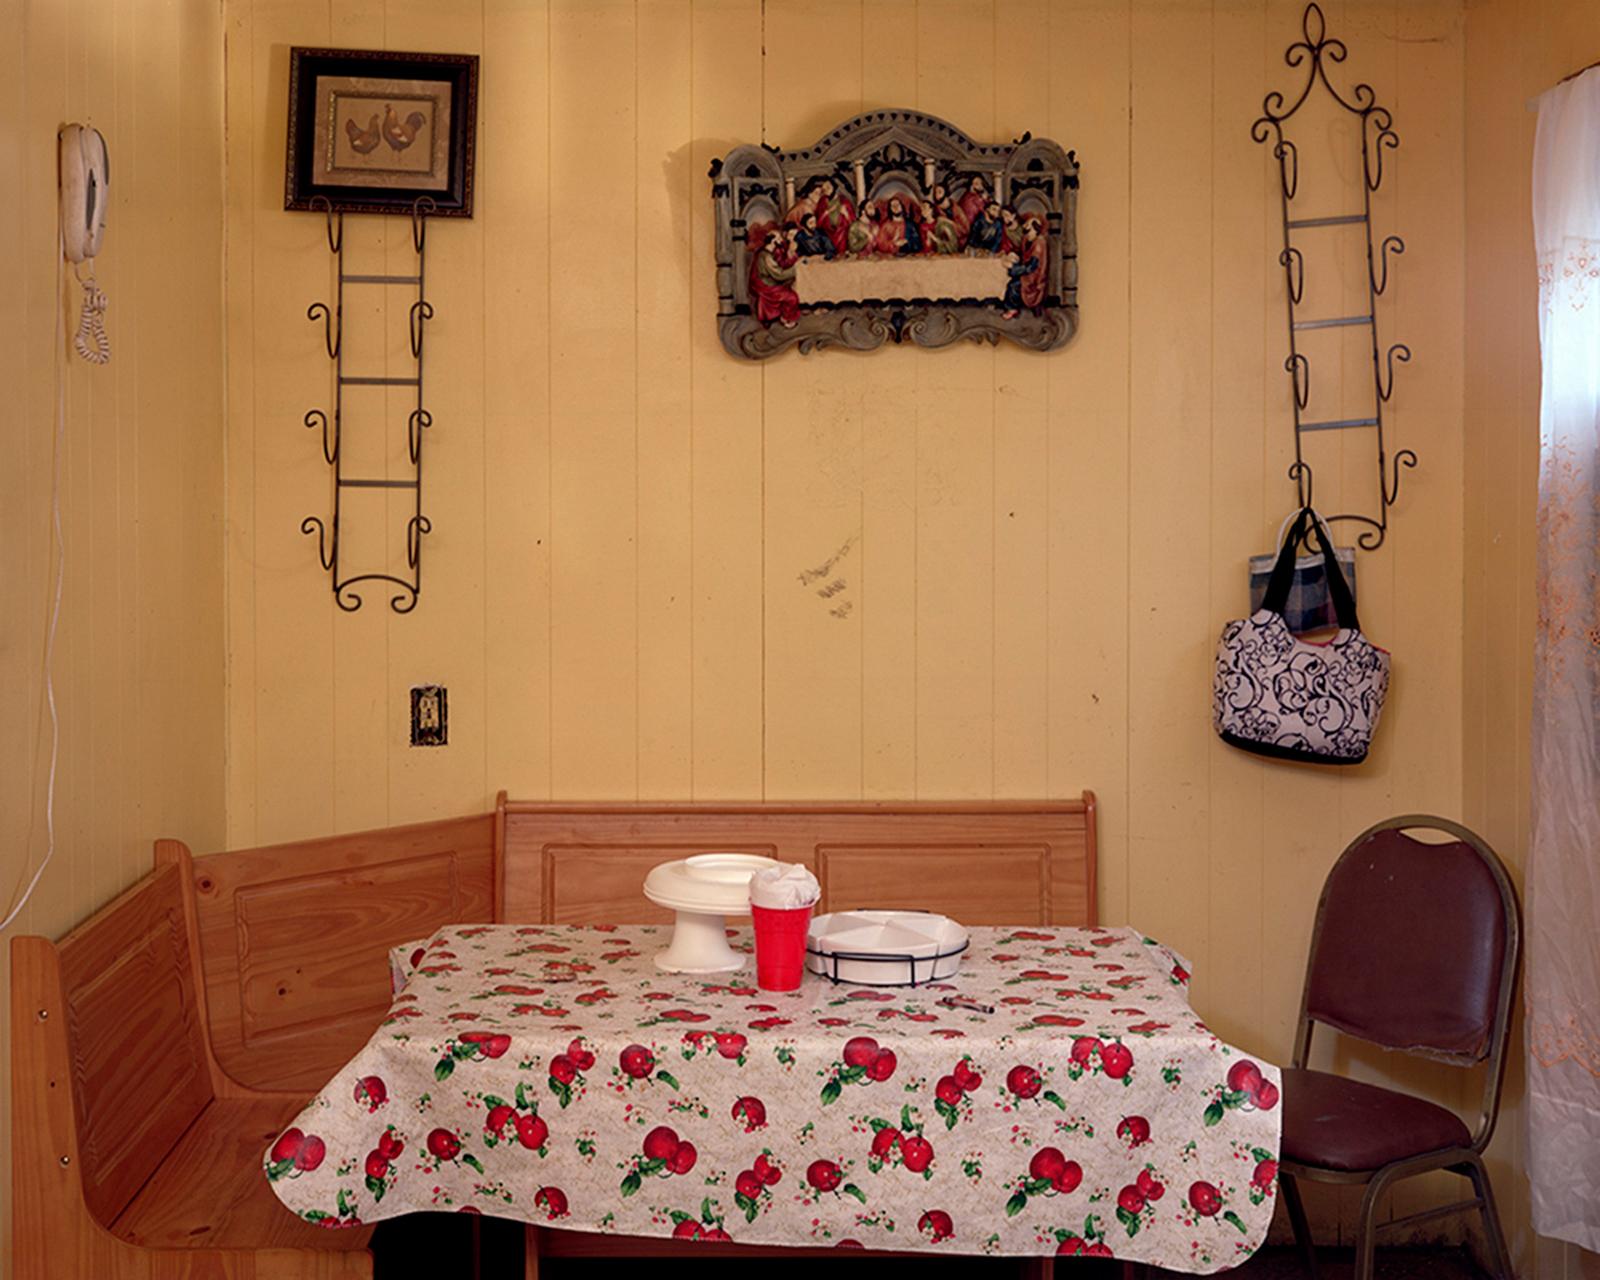 Miguel' s Kitchen, Hammond, IN, 2013 ©Juan Giraldo